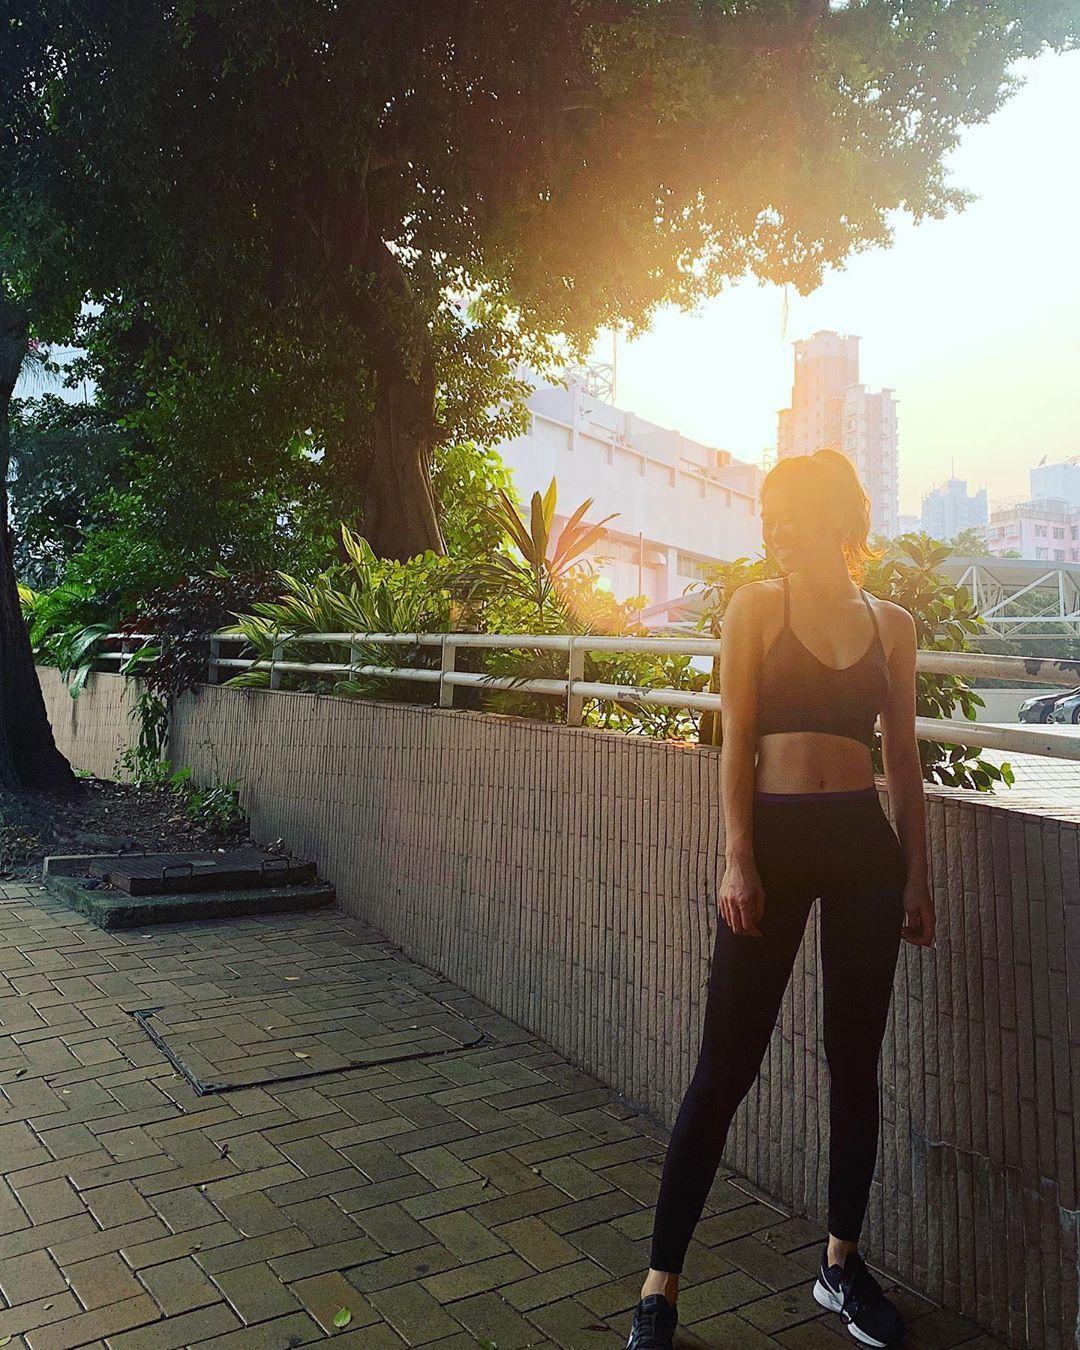 Friday Sunset Friday Gym Fitness Hongkong Sunset Fitnessgirl Shanghainese Lifestyle Instagram Sporty Ootd Lookoftheday